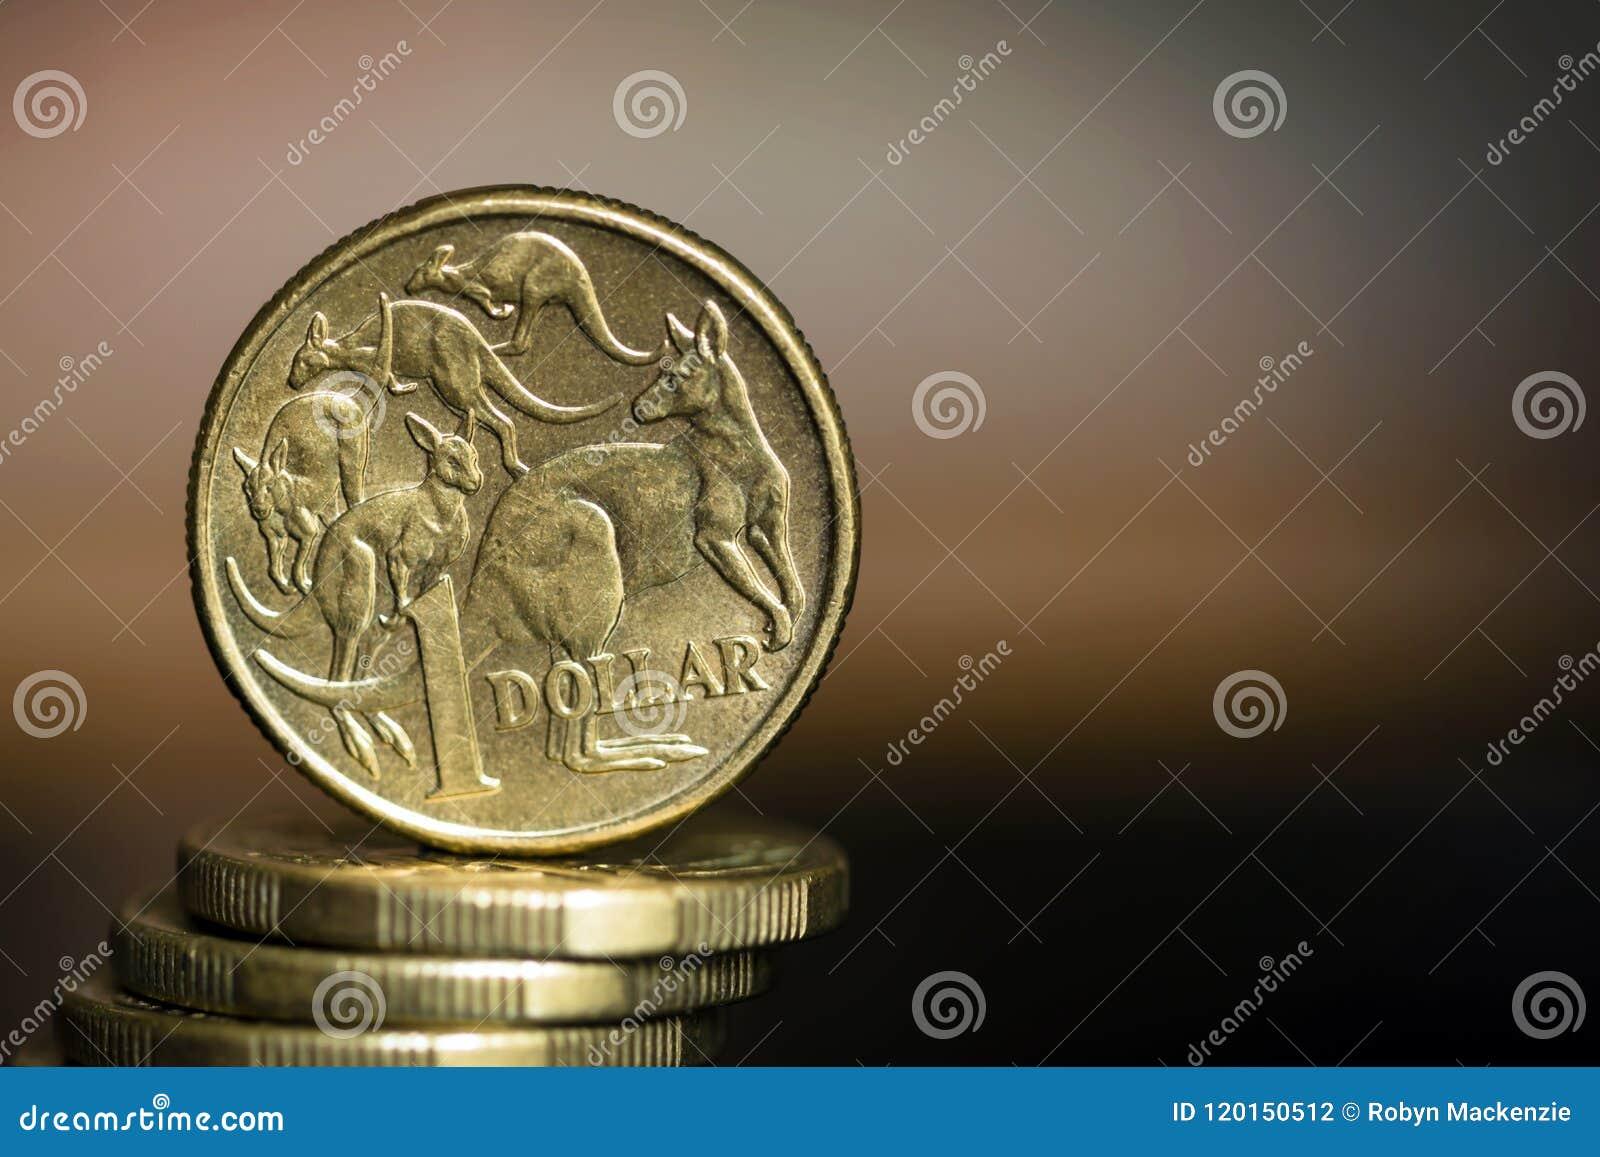 Monete del dollaro australiano sopra fondo vago con Copyspace